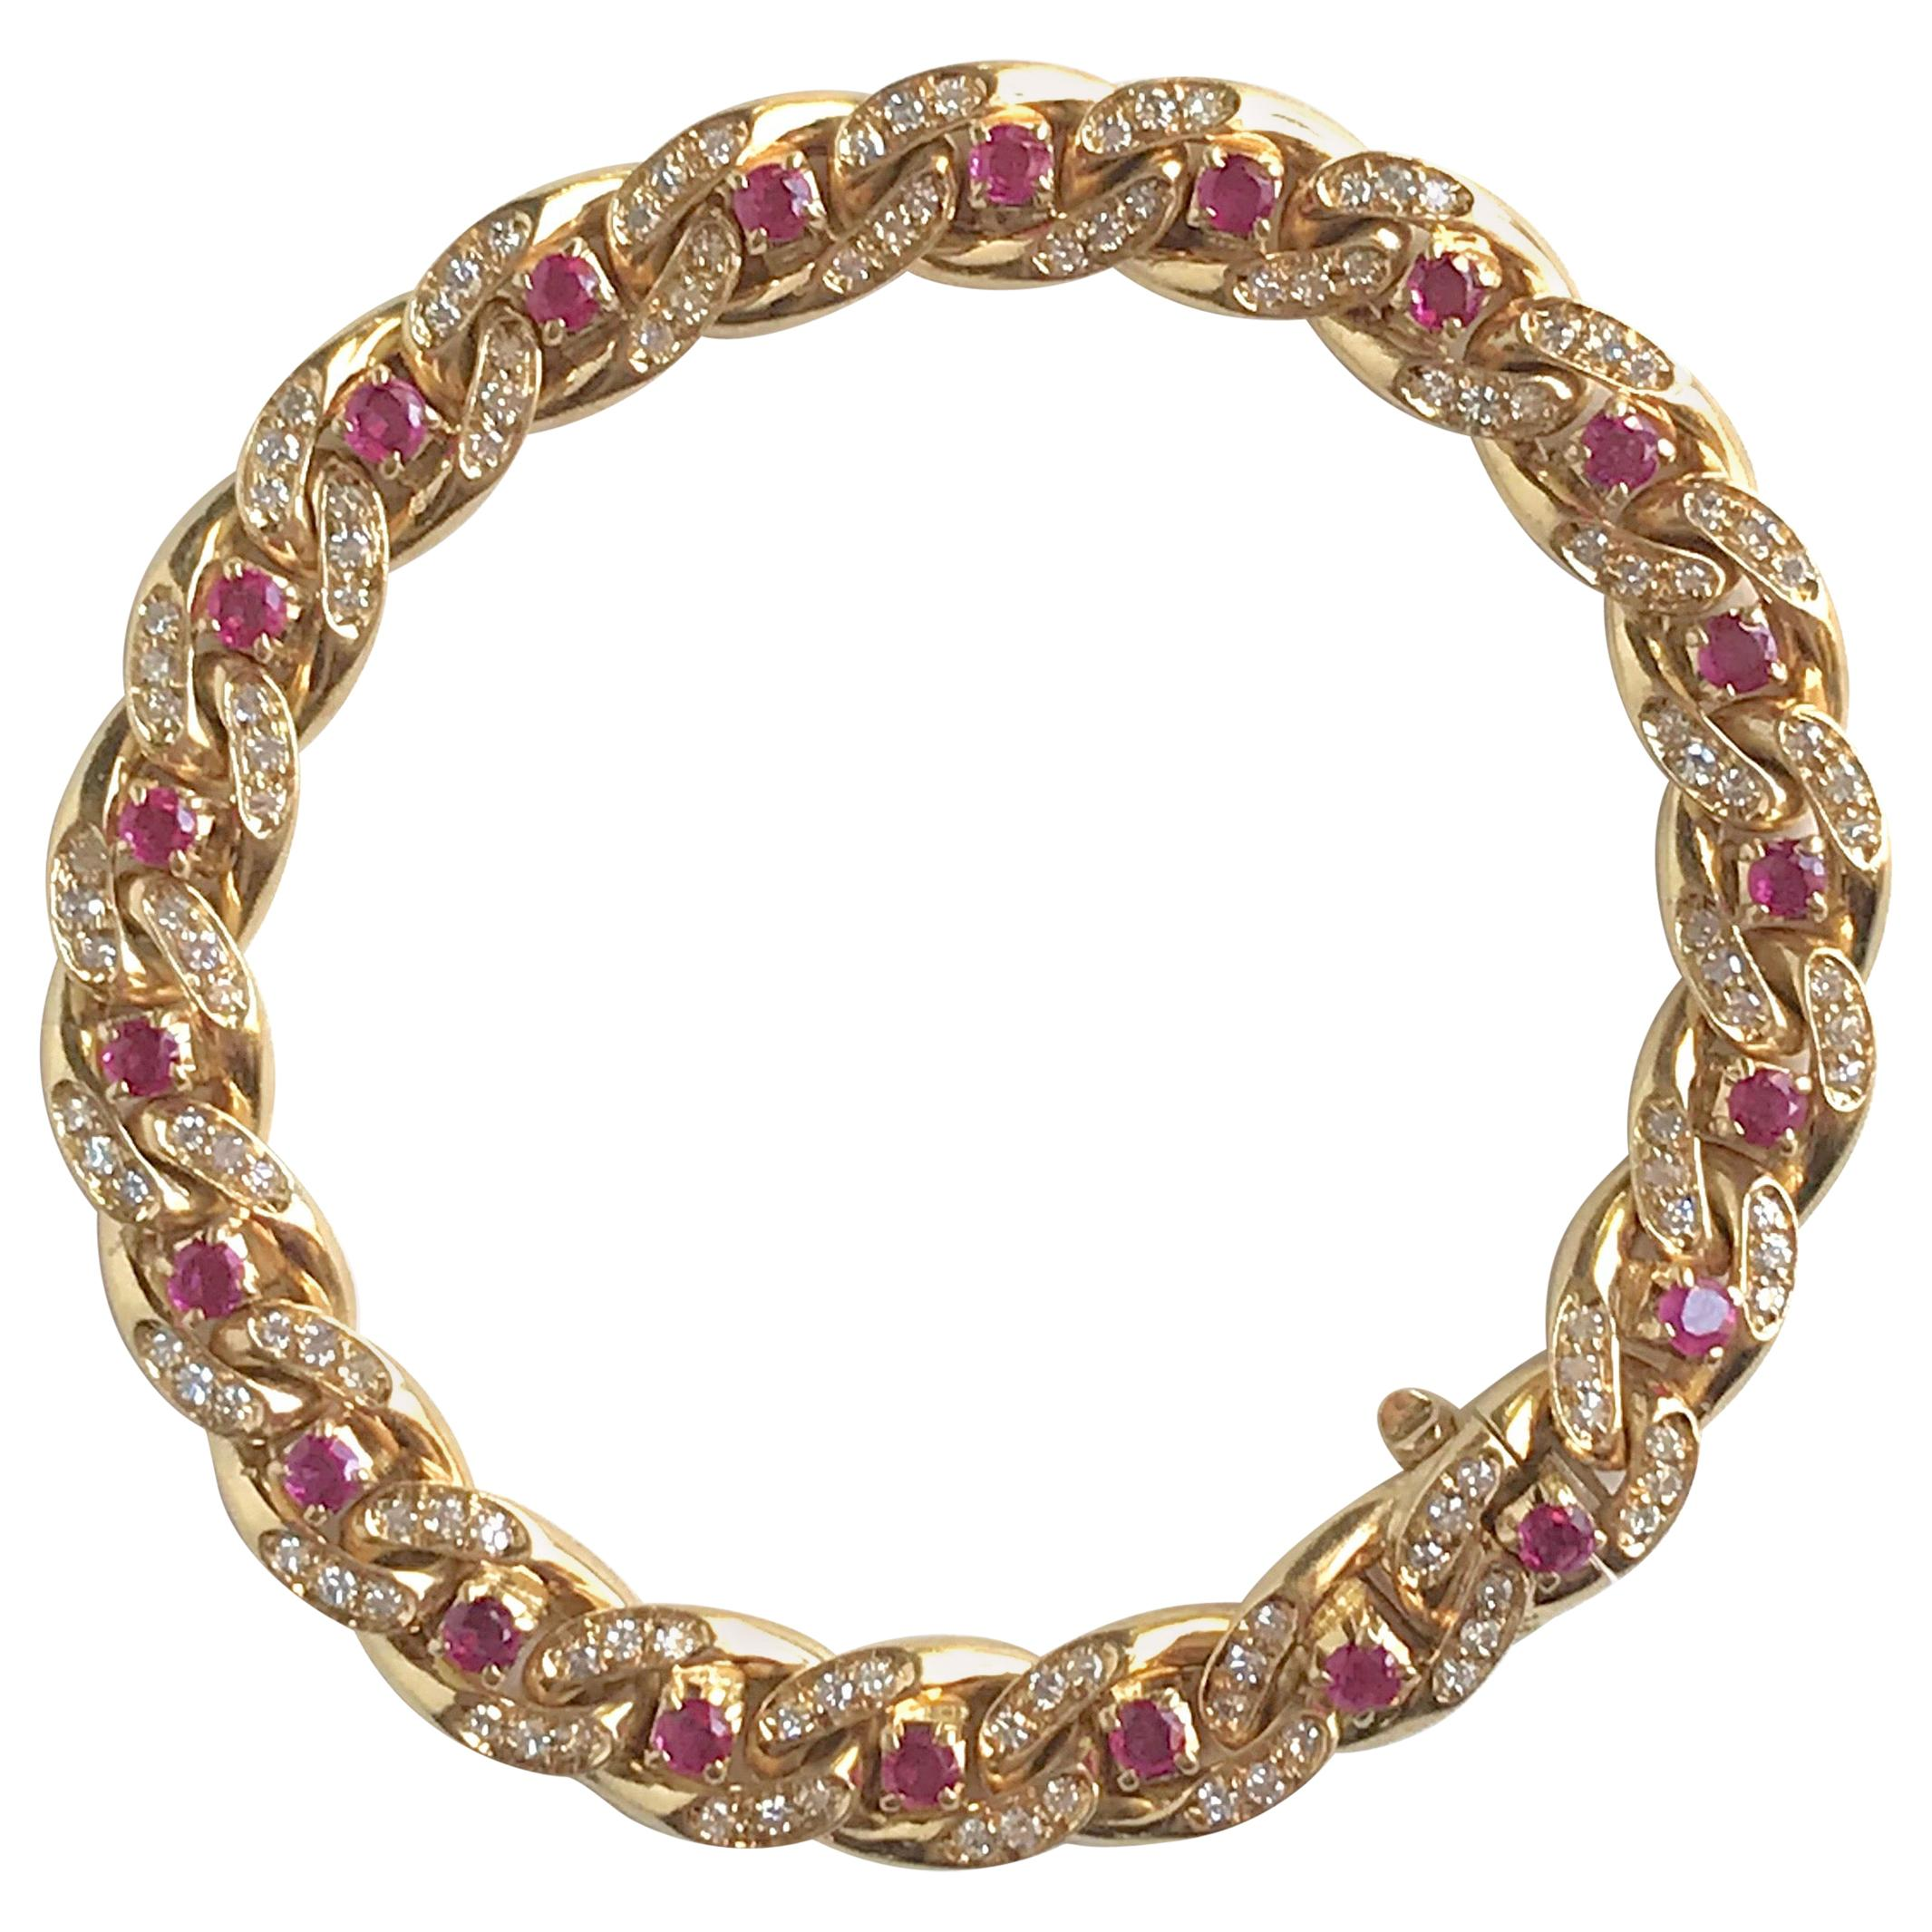 Cartier 18 Karat Yellow Gold Gourmet Link Bracelet, 22 Rubies, 132 Diamonds